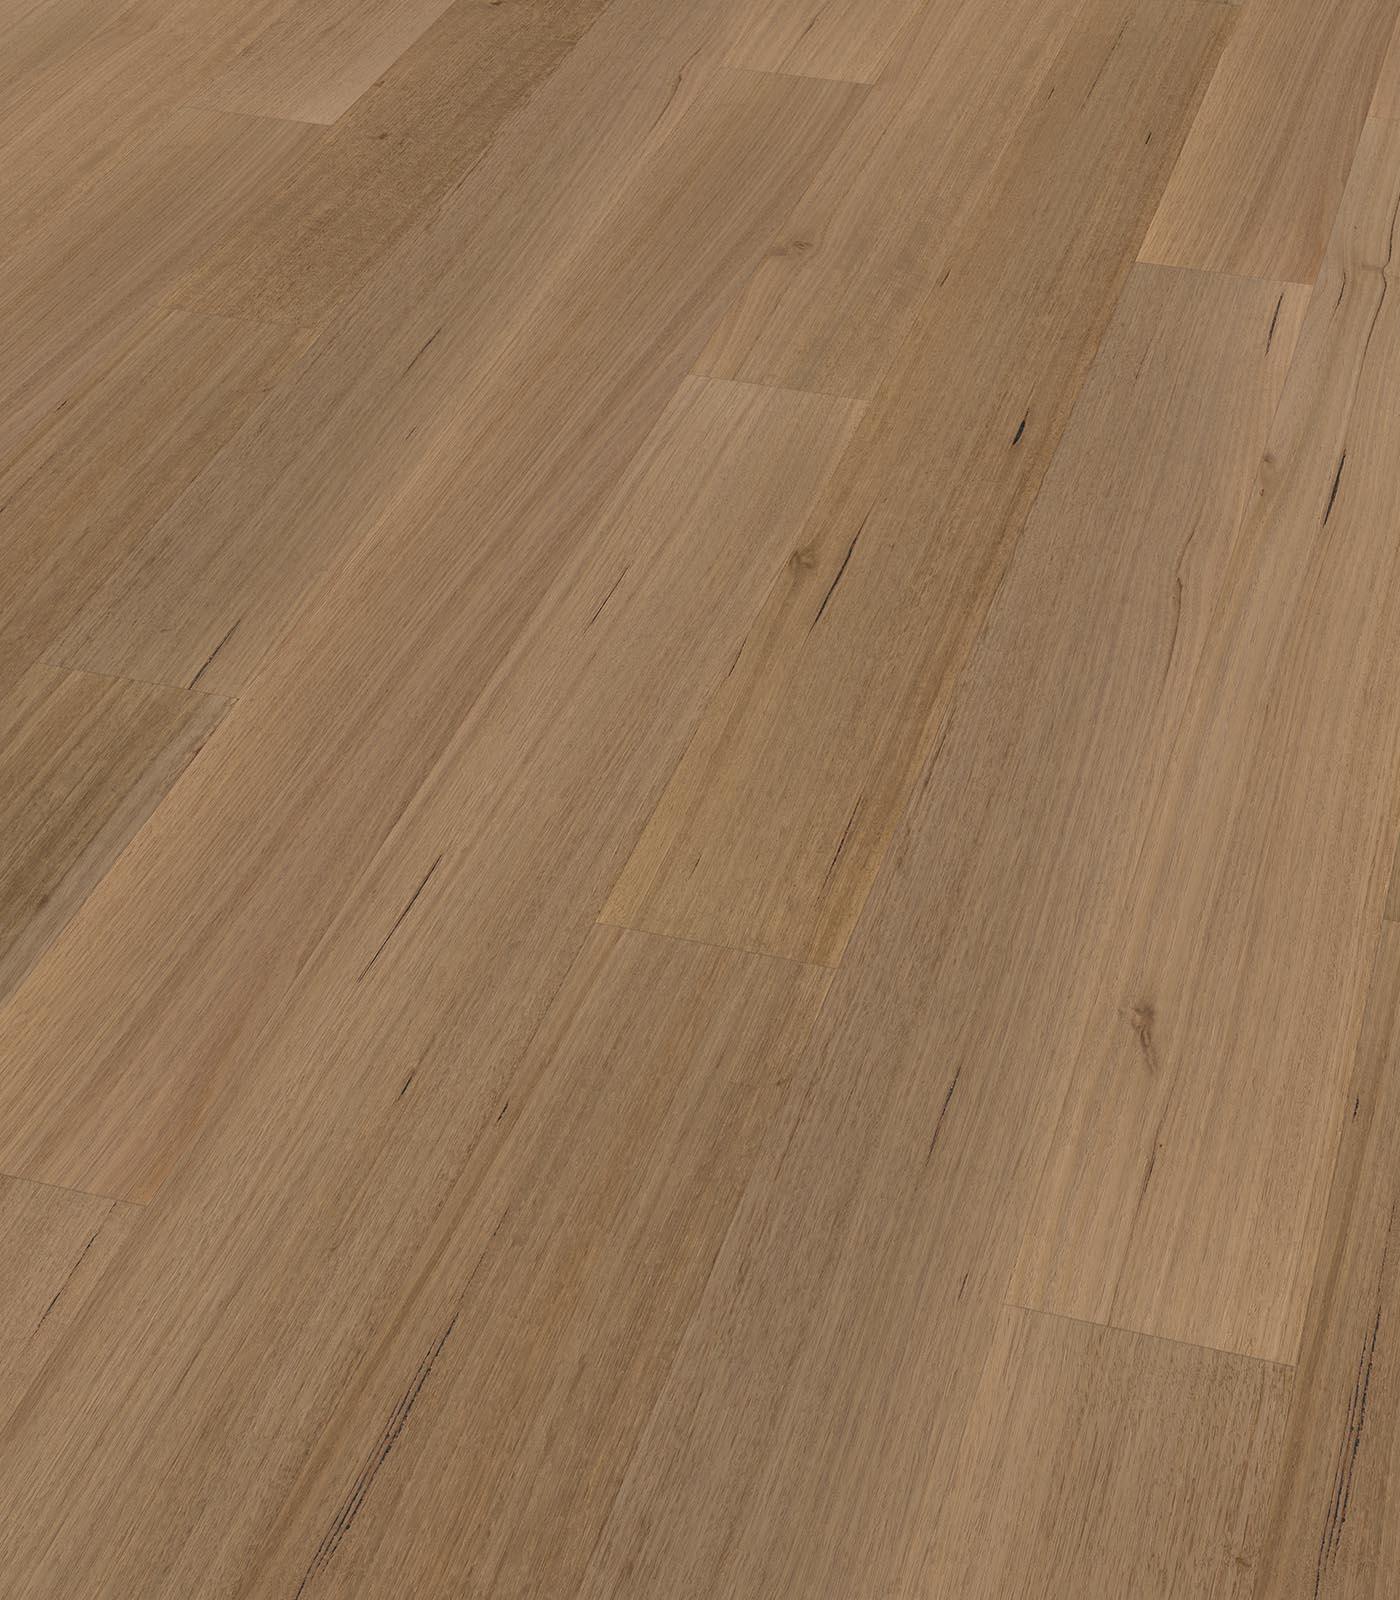 Albany-Tasmanian oak Floors-After Oak Collection-angle